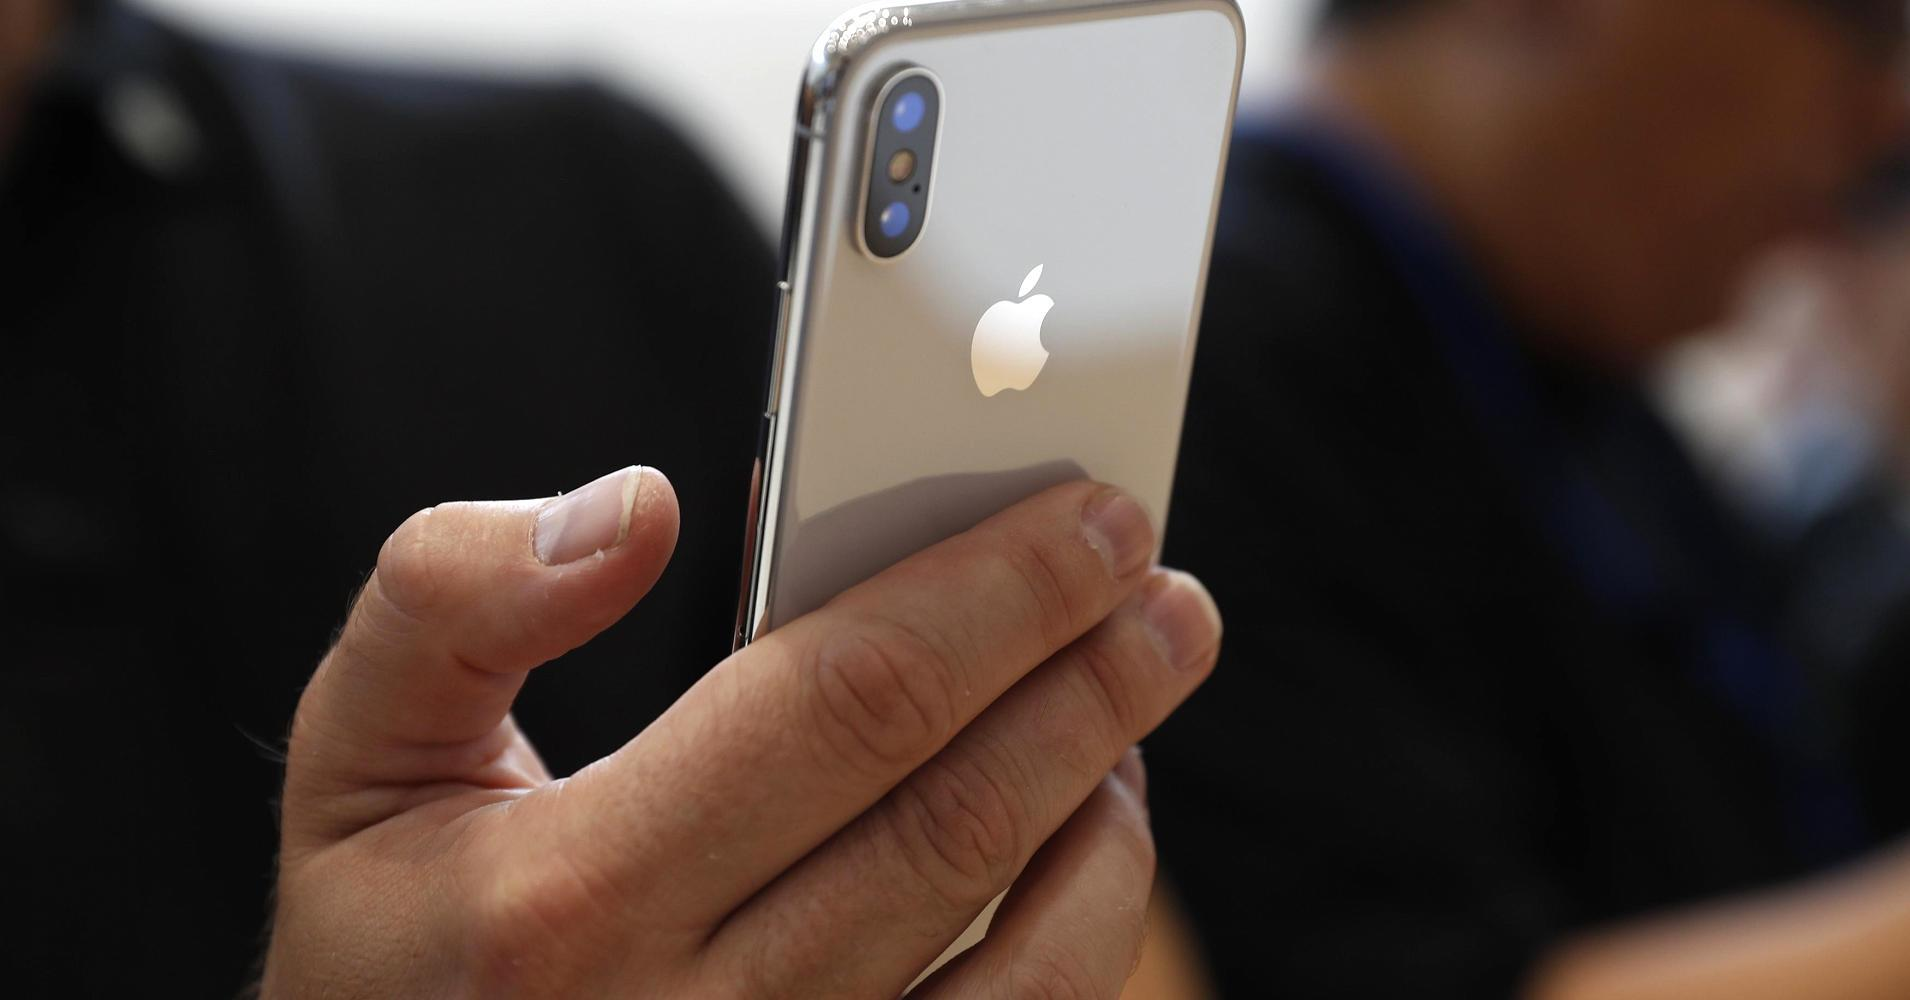 IPhone X 10 In Ghana Kenya Nigeria Buy Swap Price Specs